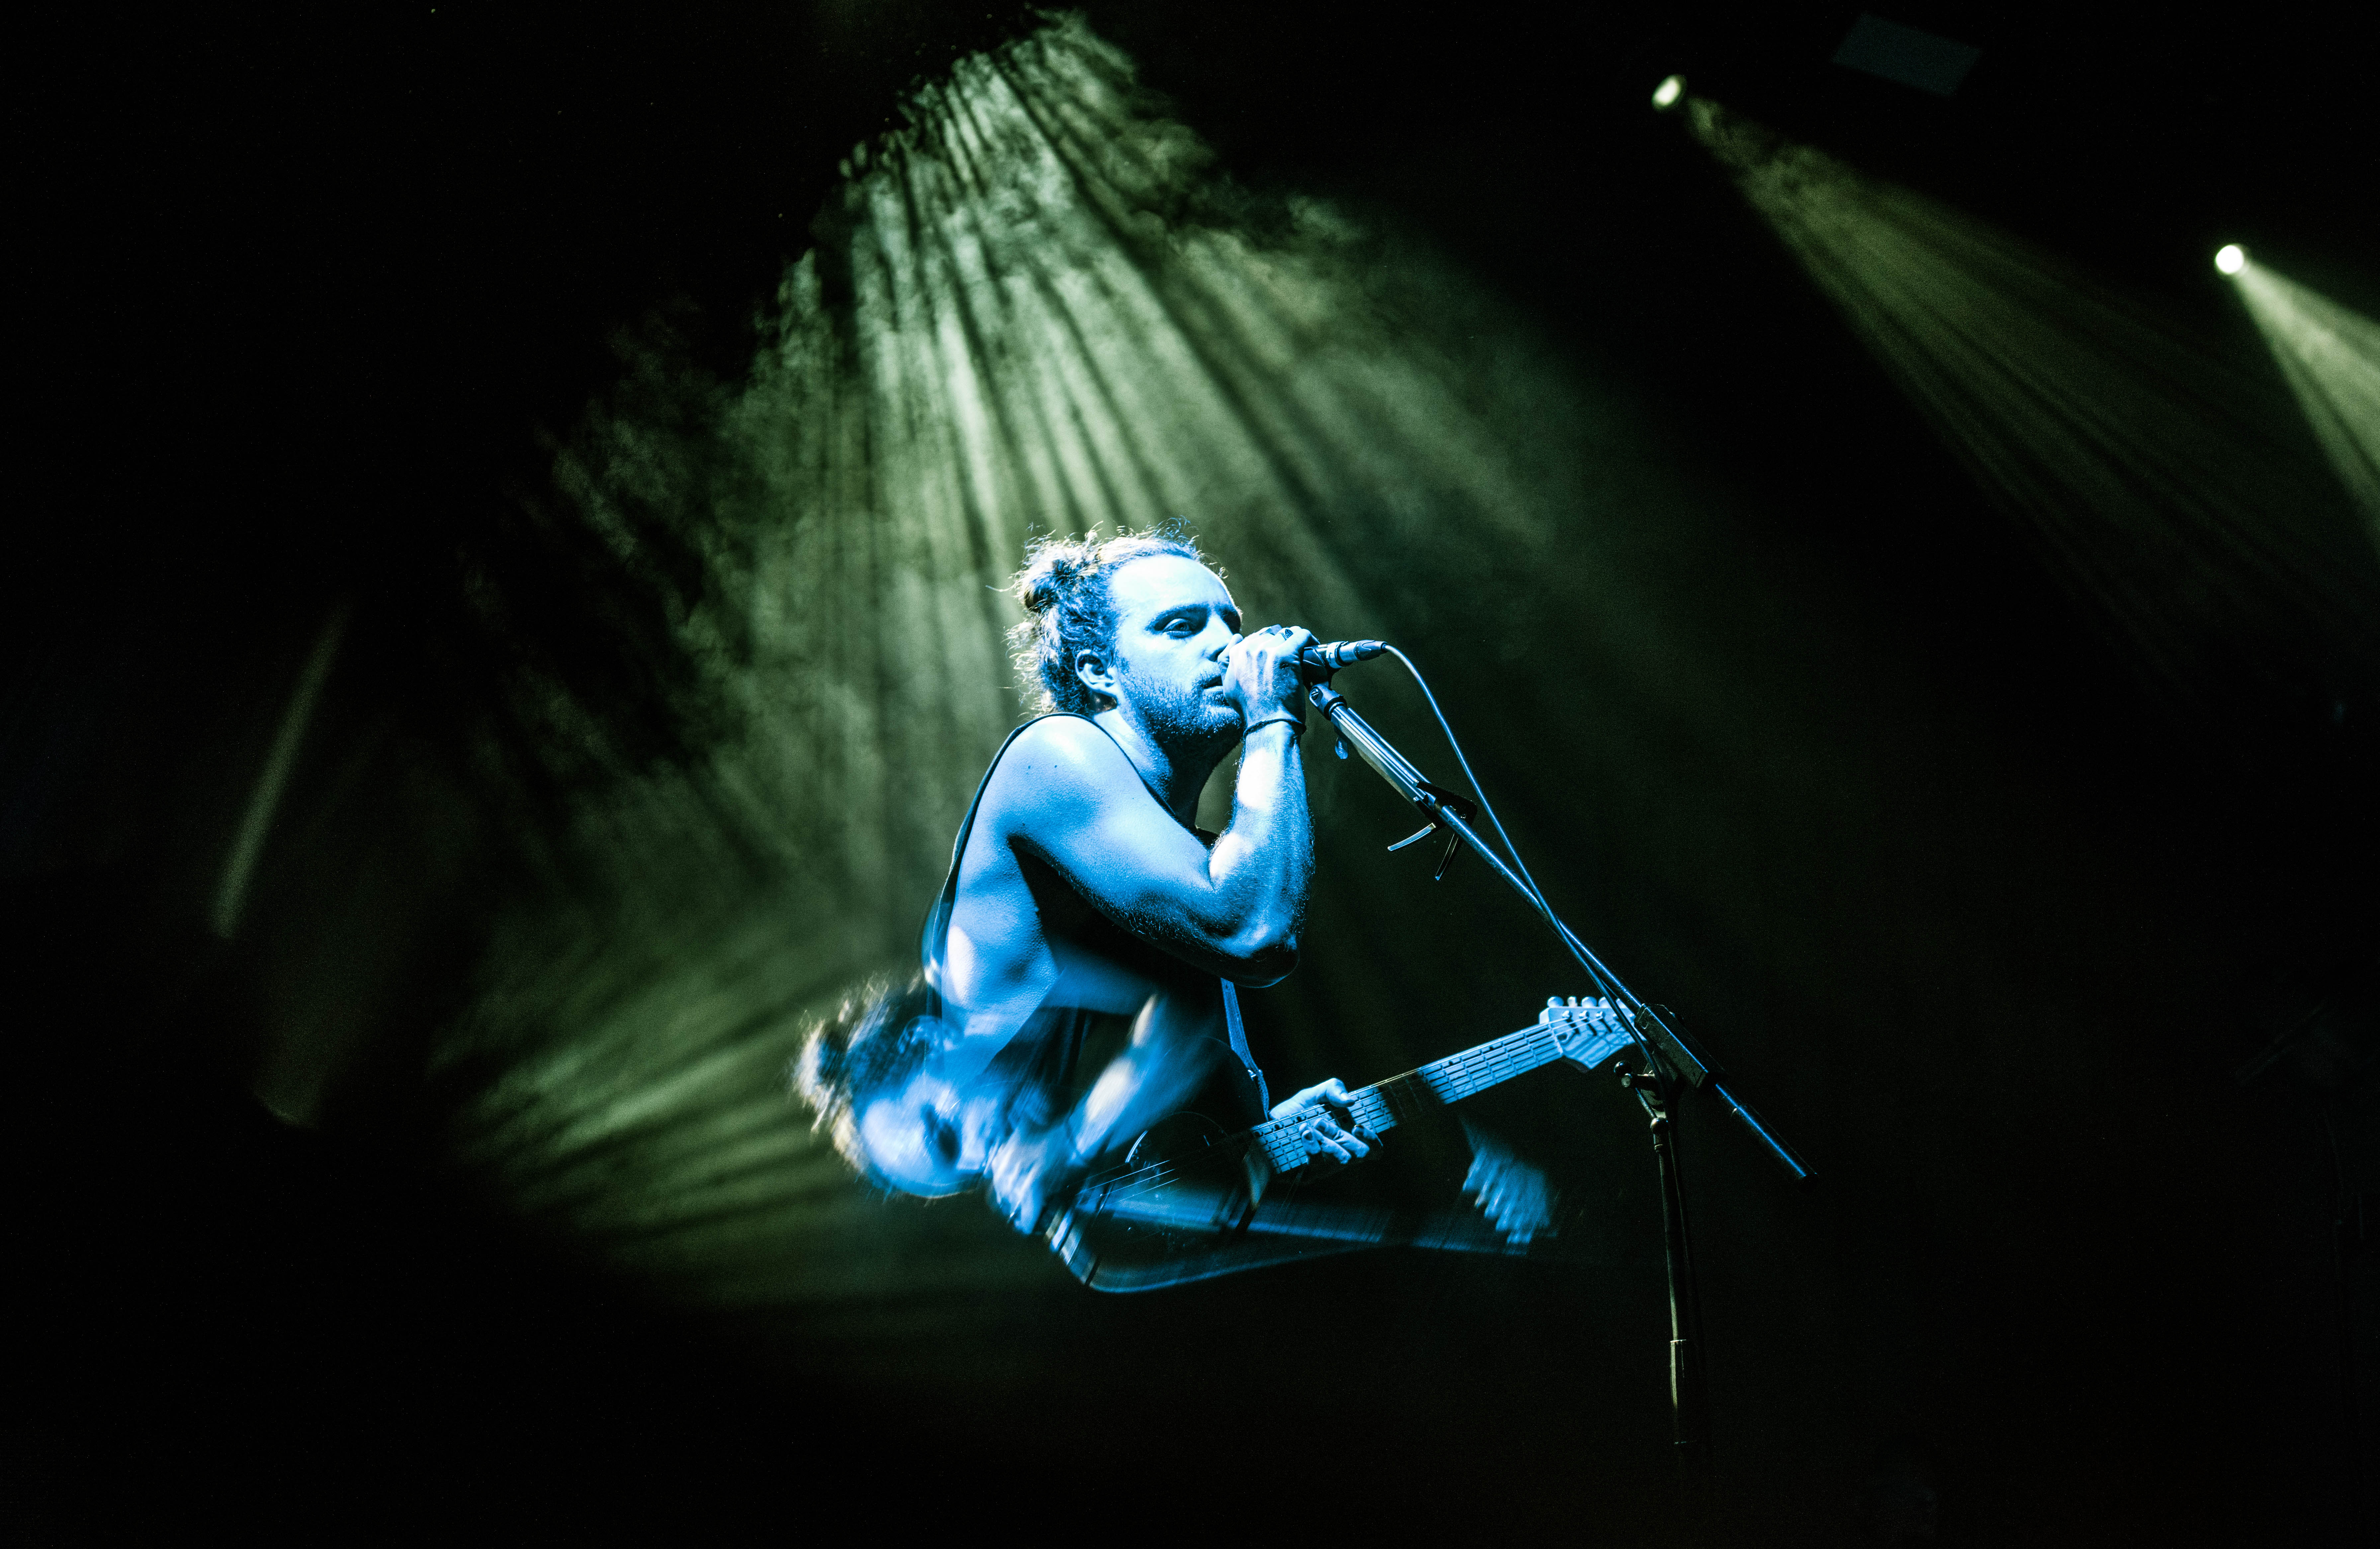 boo seeka music live review sydney photo credit dominique burns blackwell savage thrills savagethrills 2